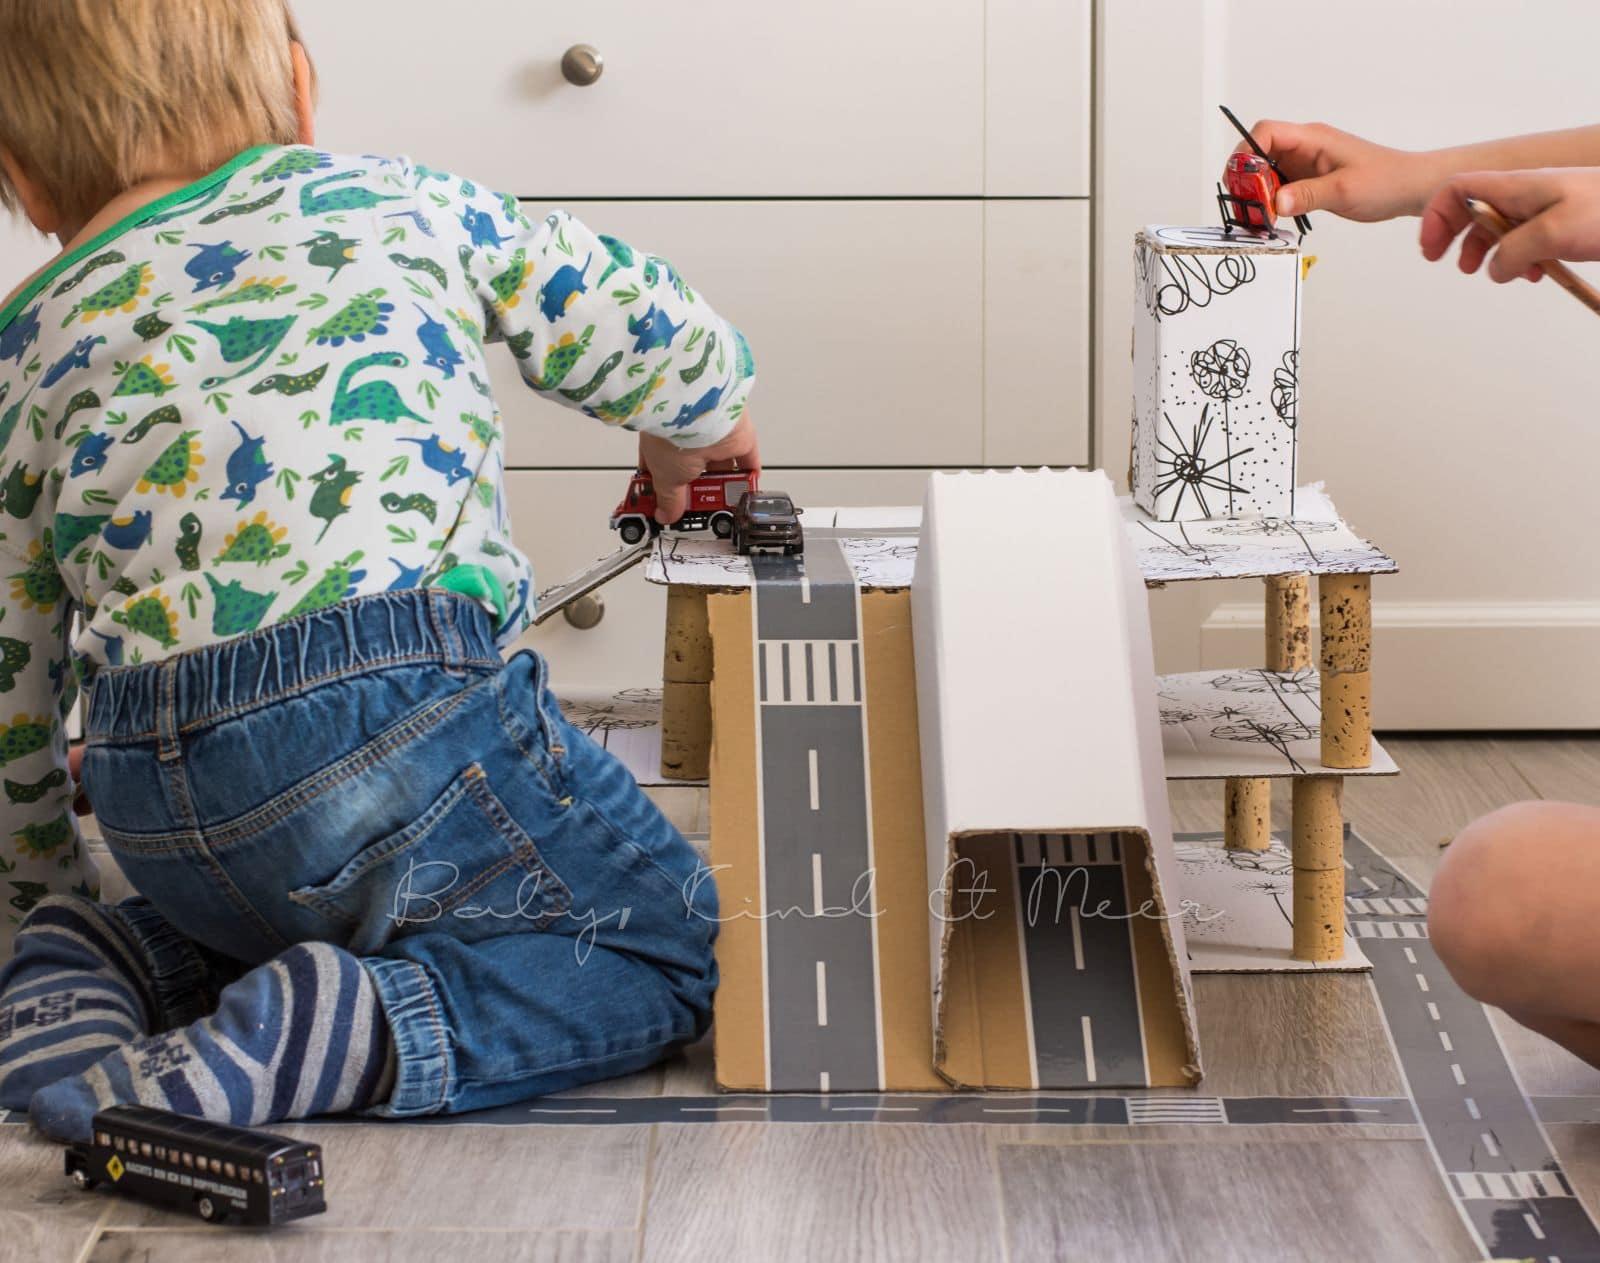 upcycling ideen einfach upcycling ideen einfach kneipp lavendelblog vier einfache upcycling. Black Bedroom Furniture Sets. Home Design Ideas